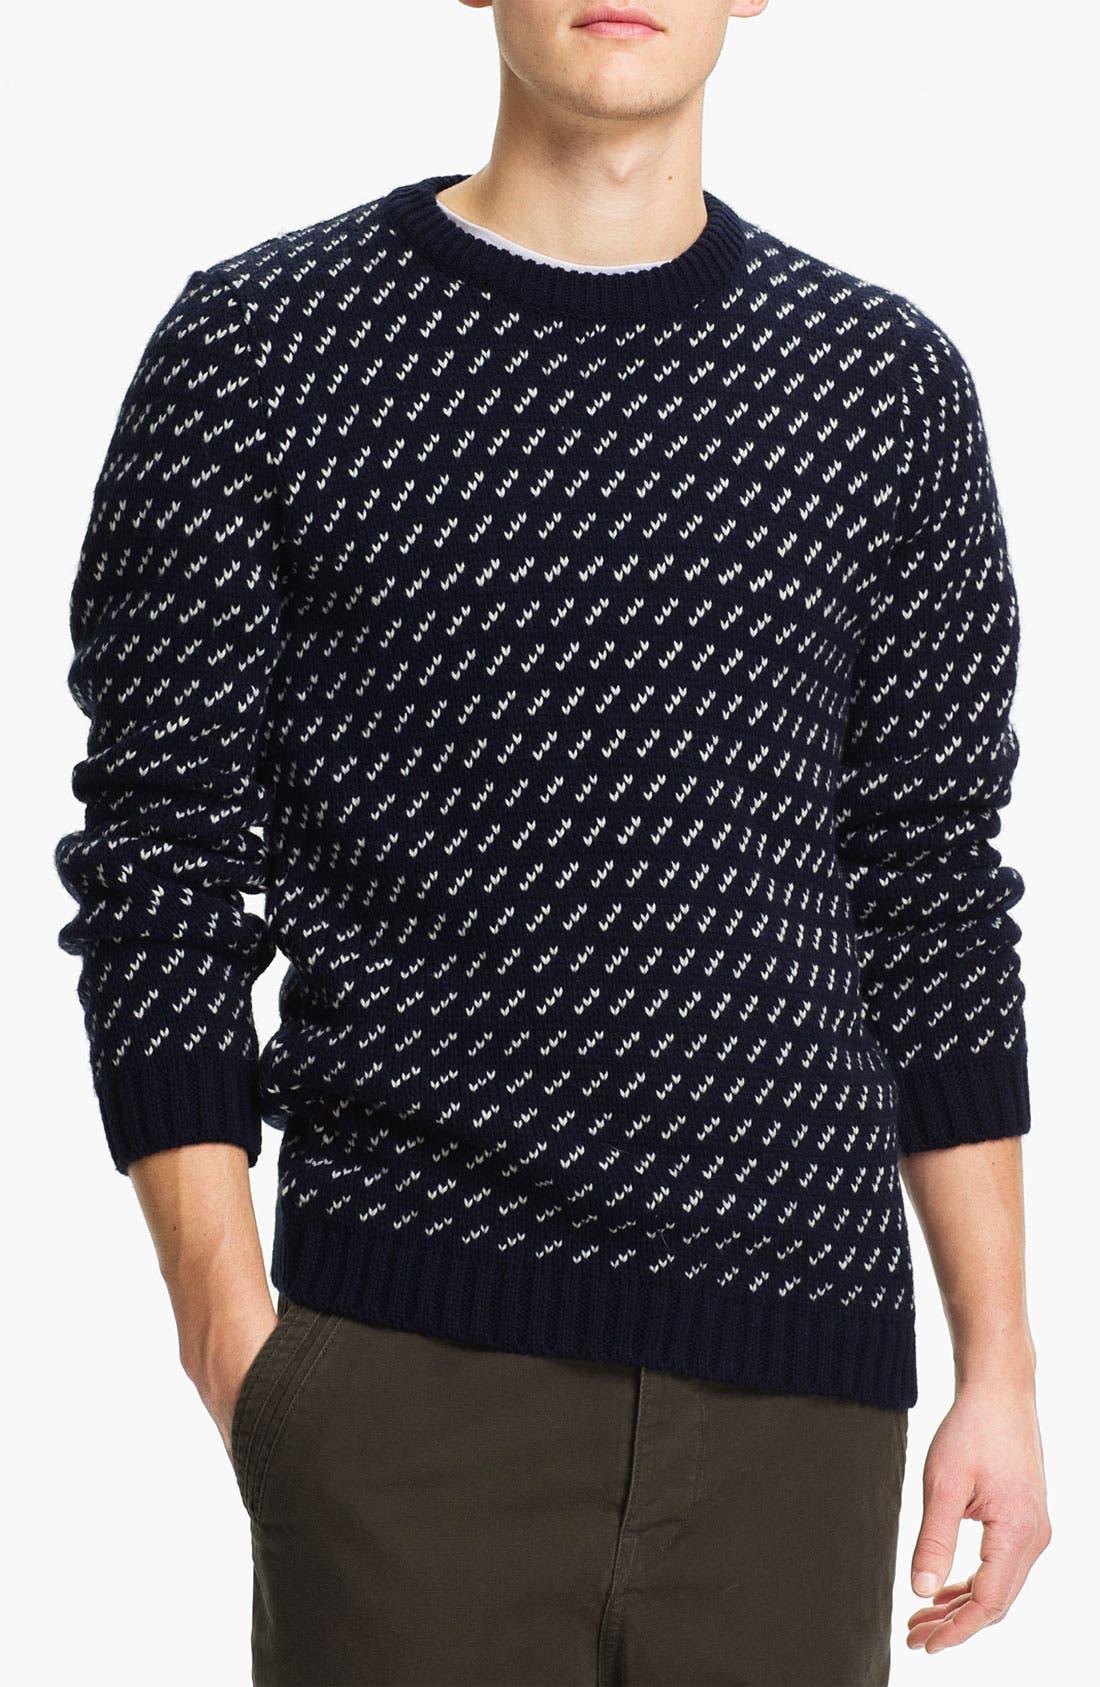 Alternate Image 1 Selected - Topman 'Dash' Knit Crewneck Sweater